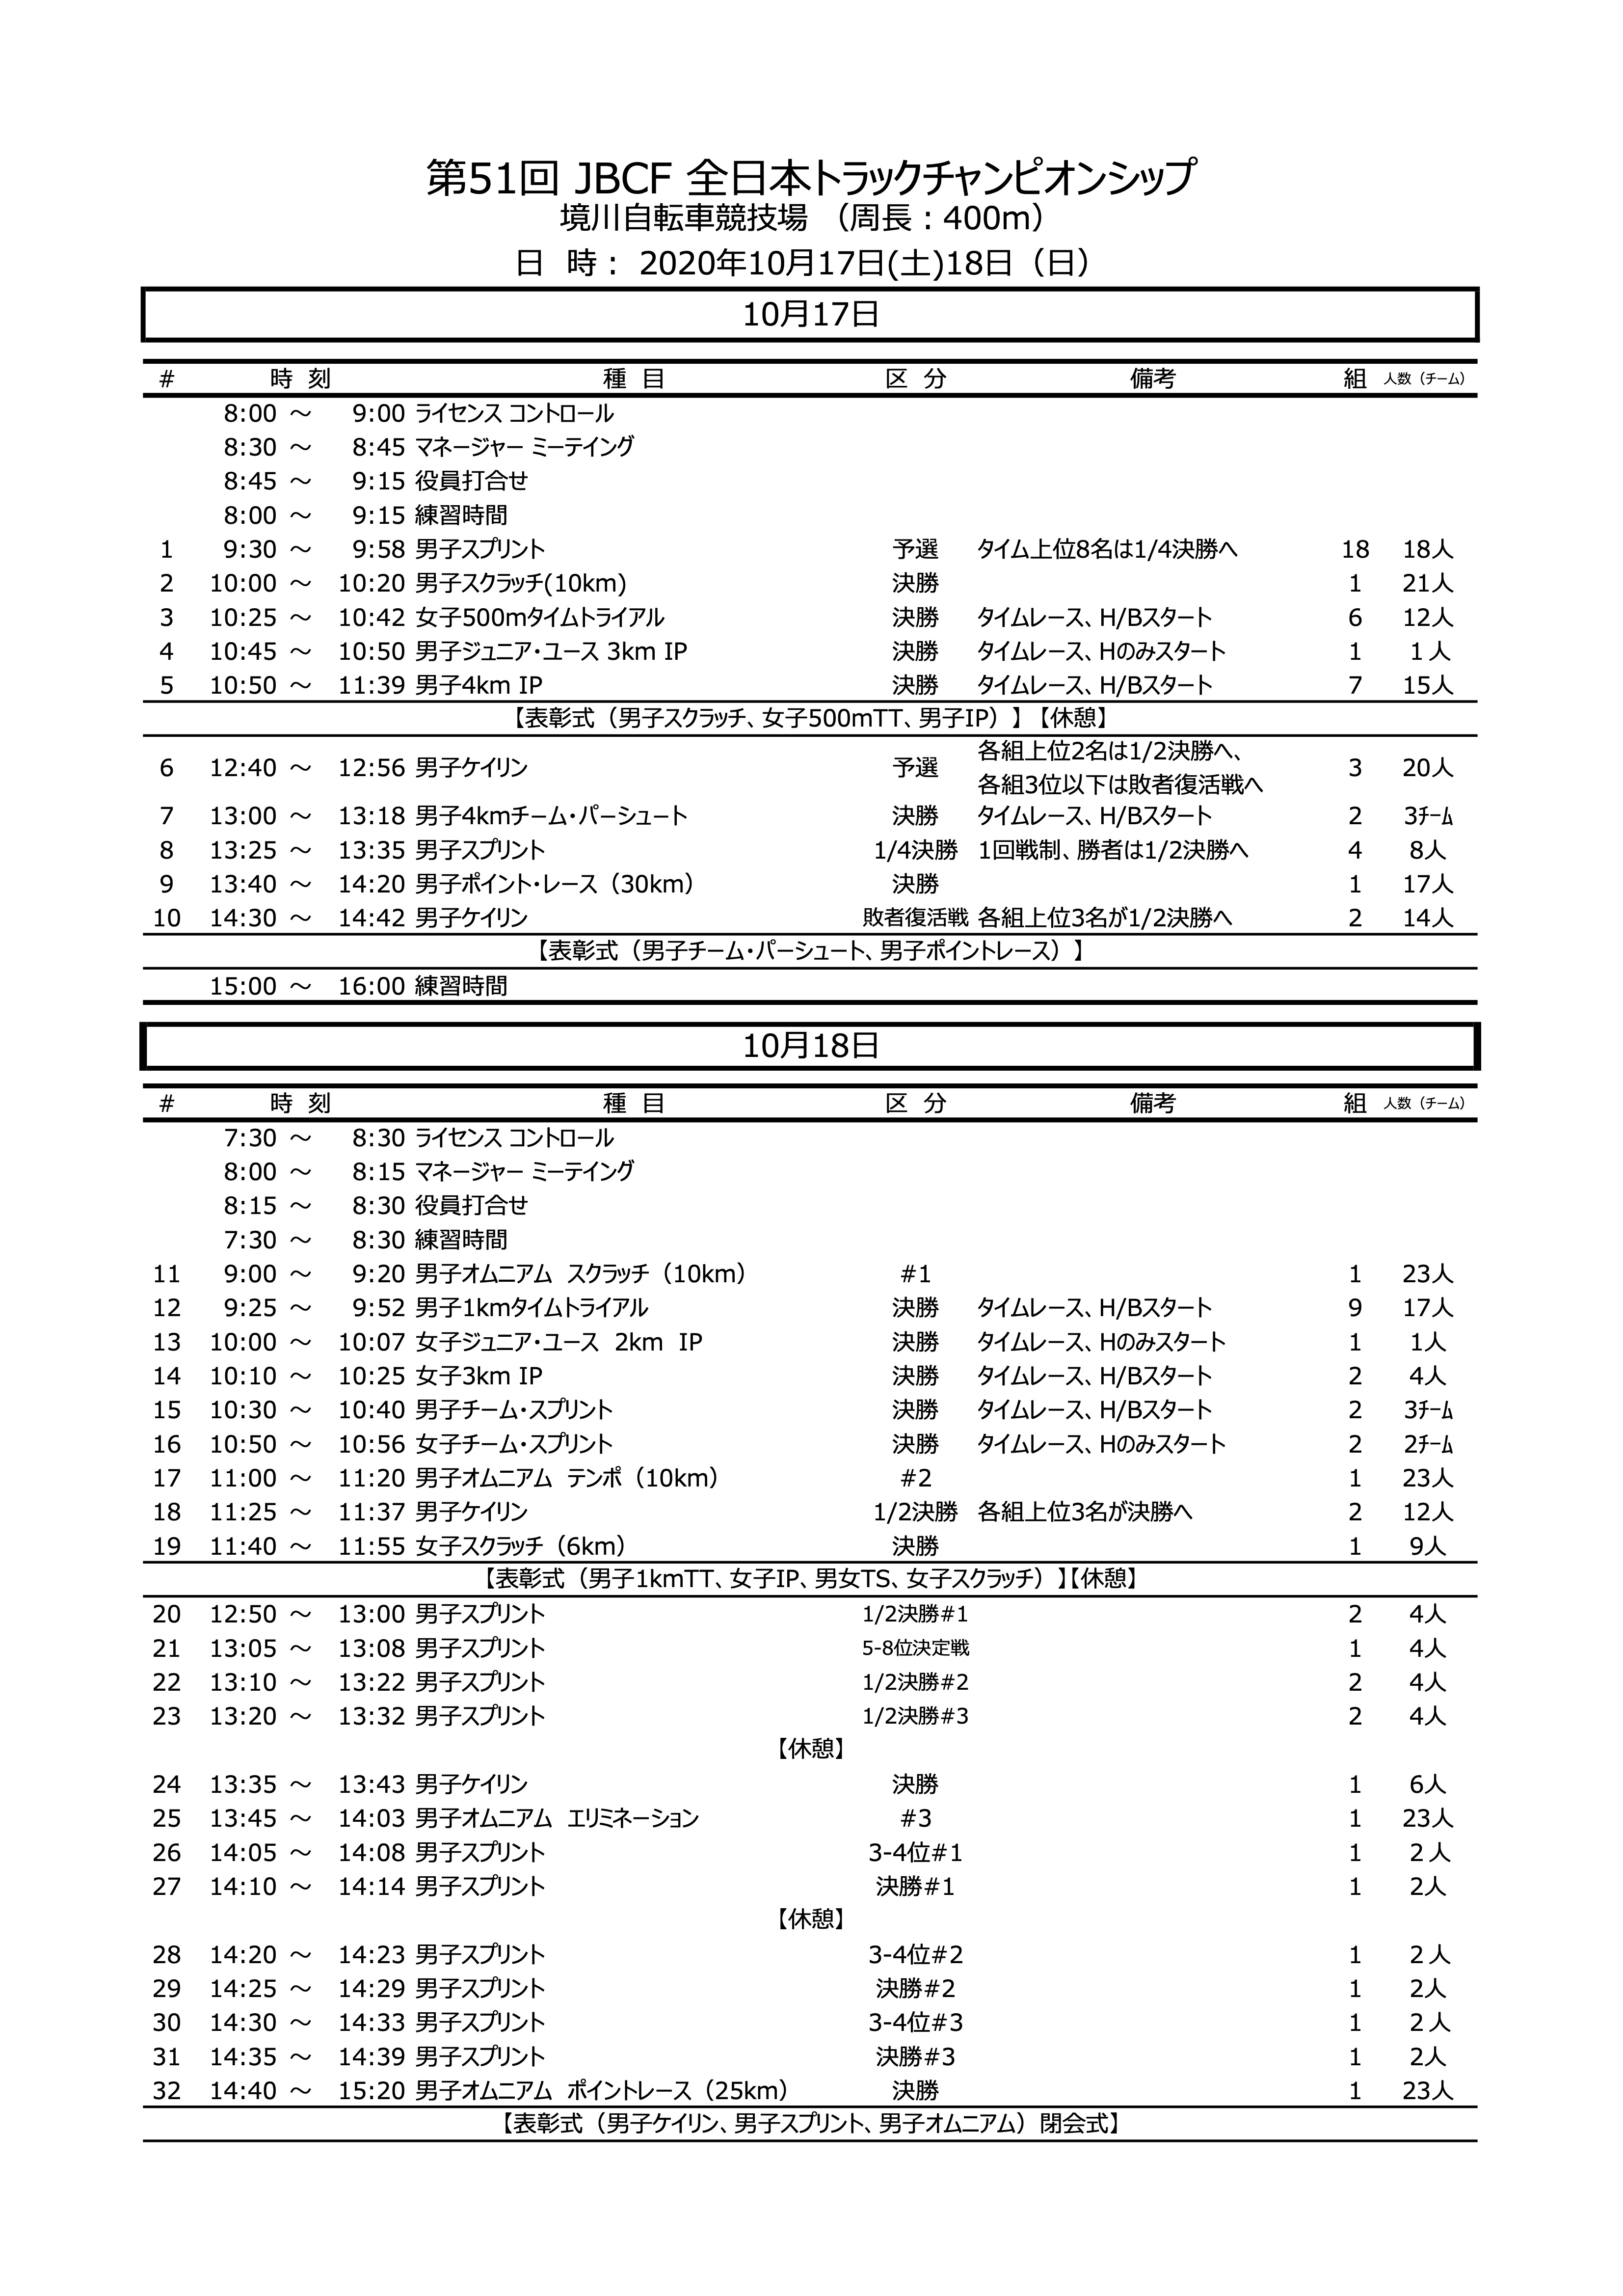 JBCFトラック大会スケジュール.jpg